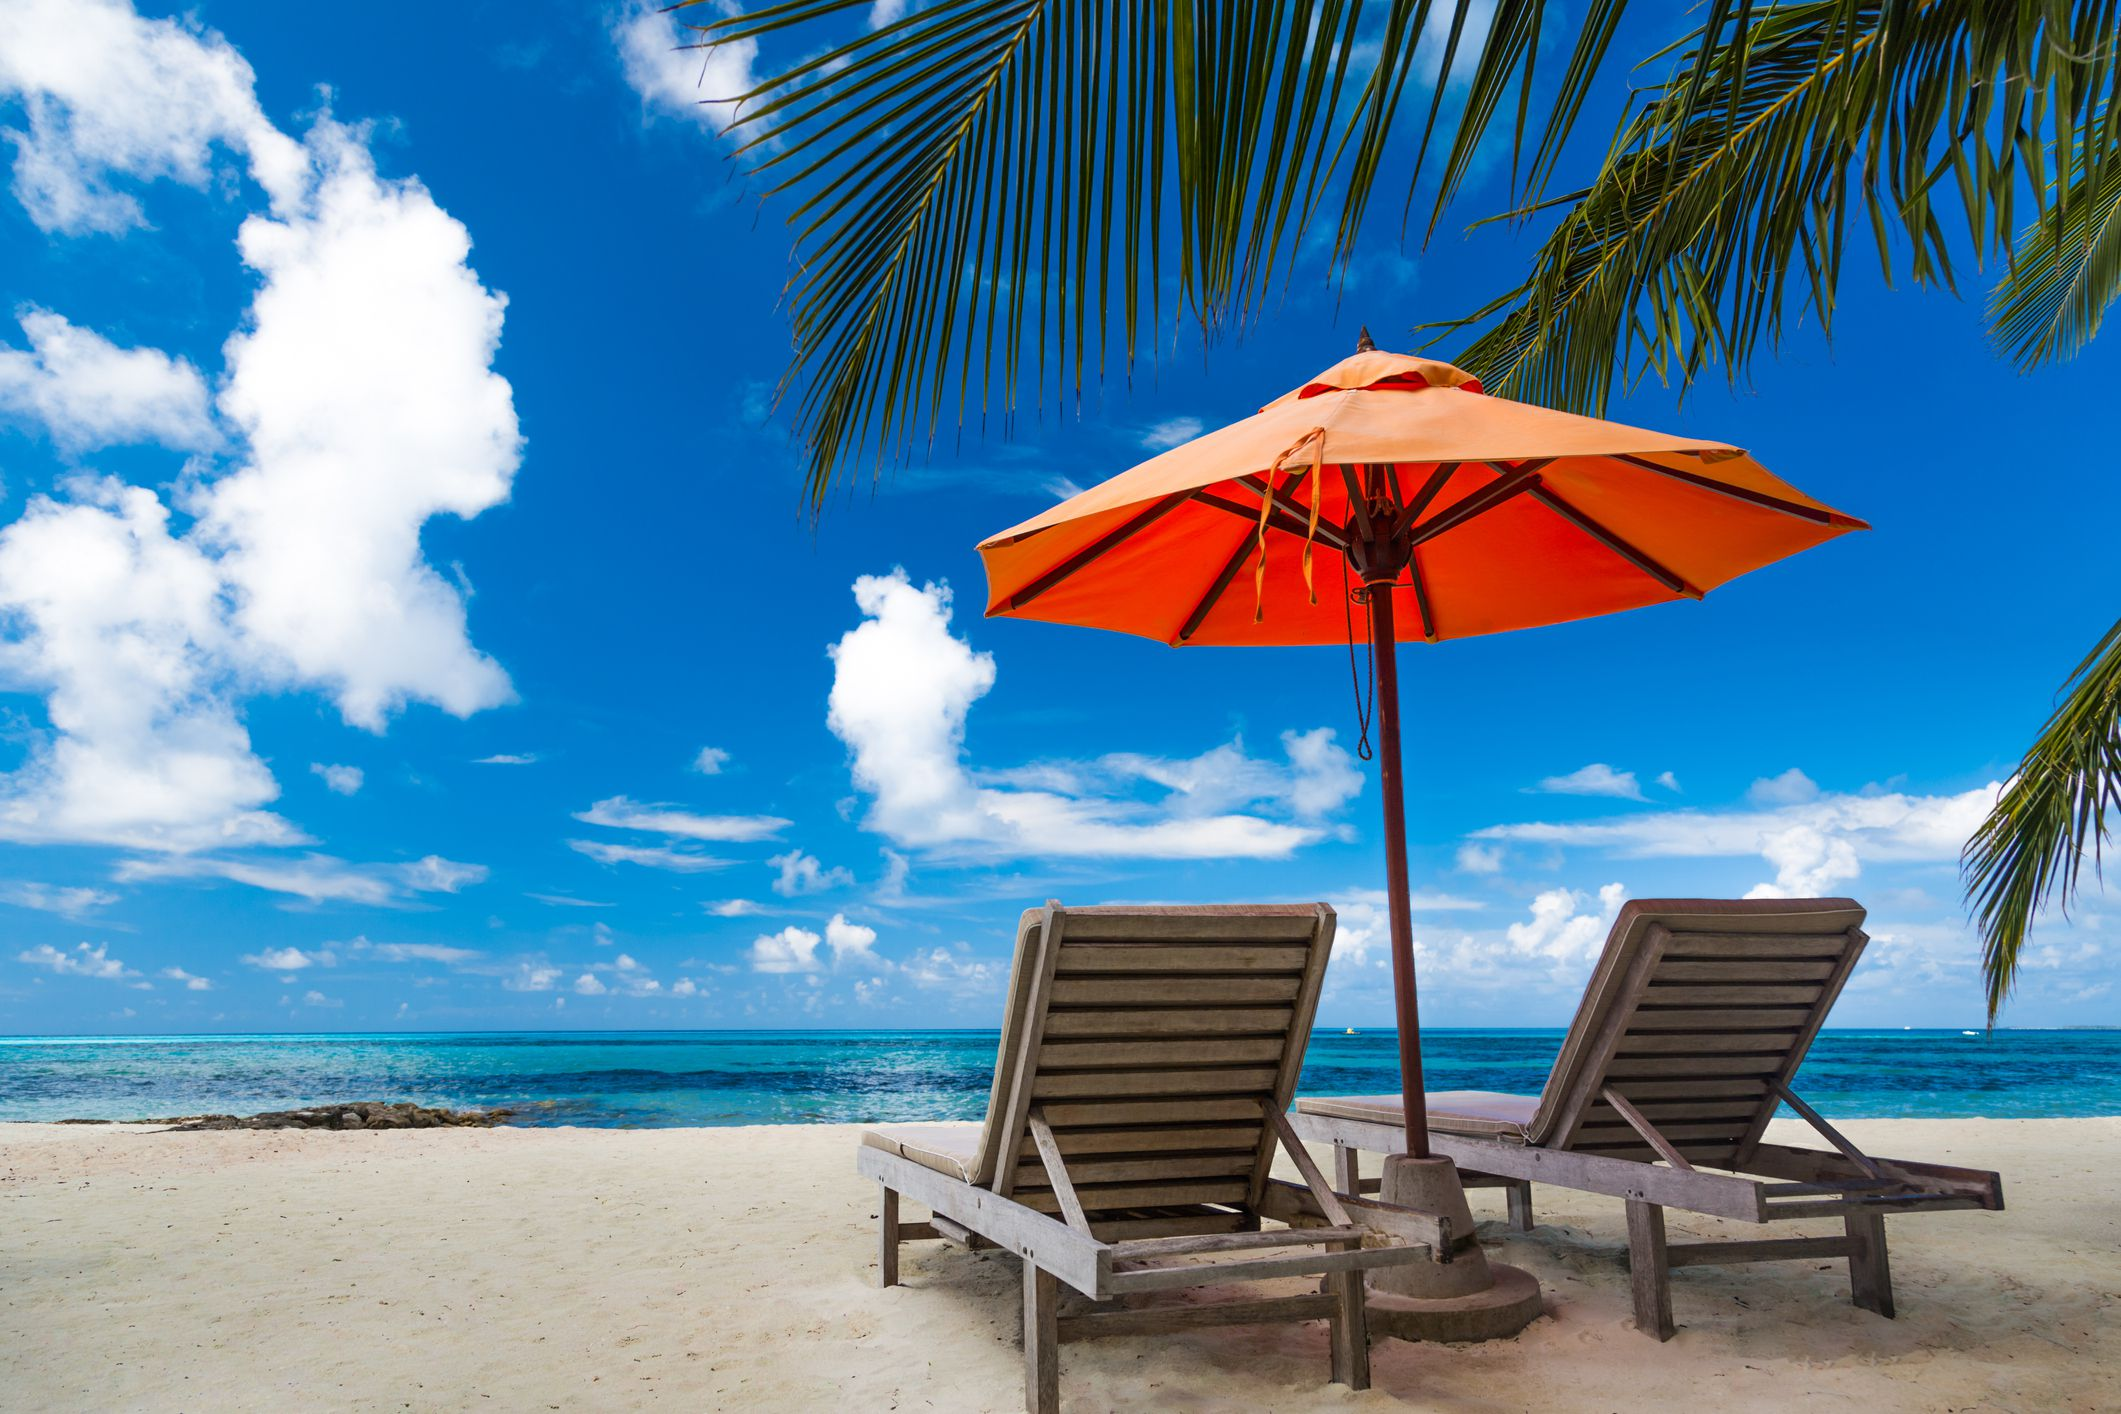 8bb5494b76 The 7 Best Beach Umbrella Anchors of 2019